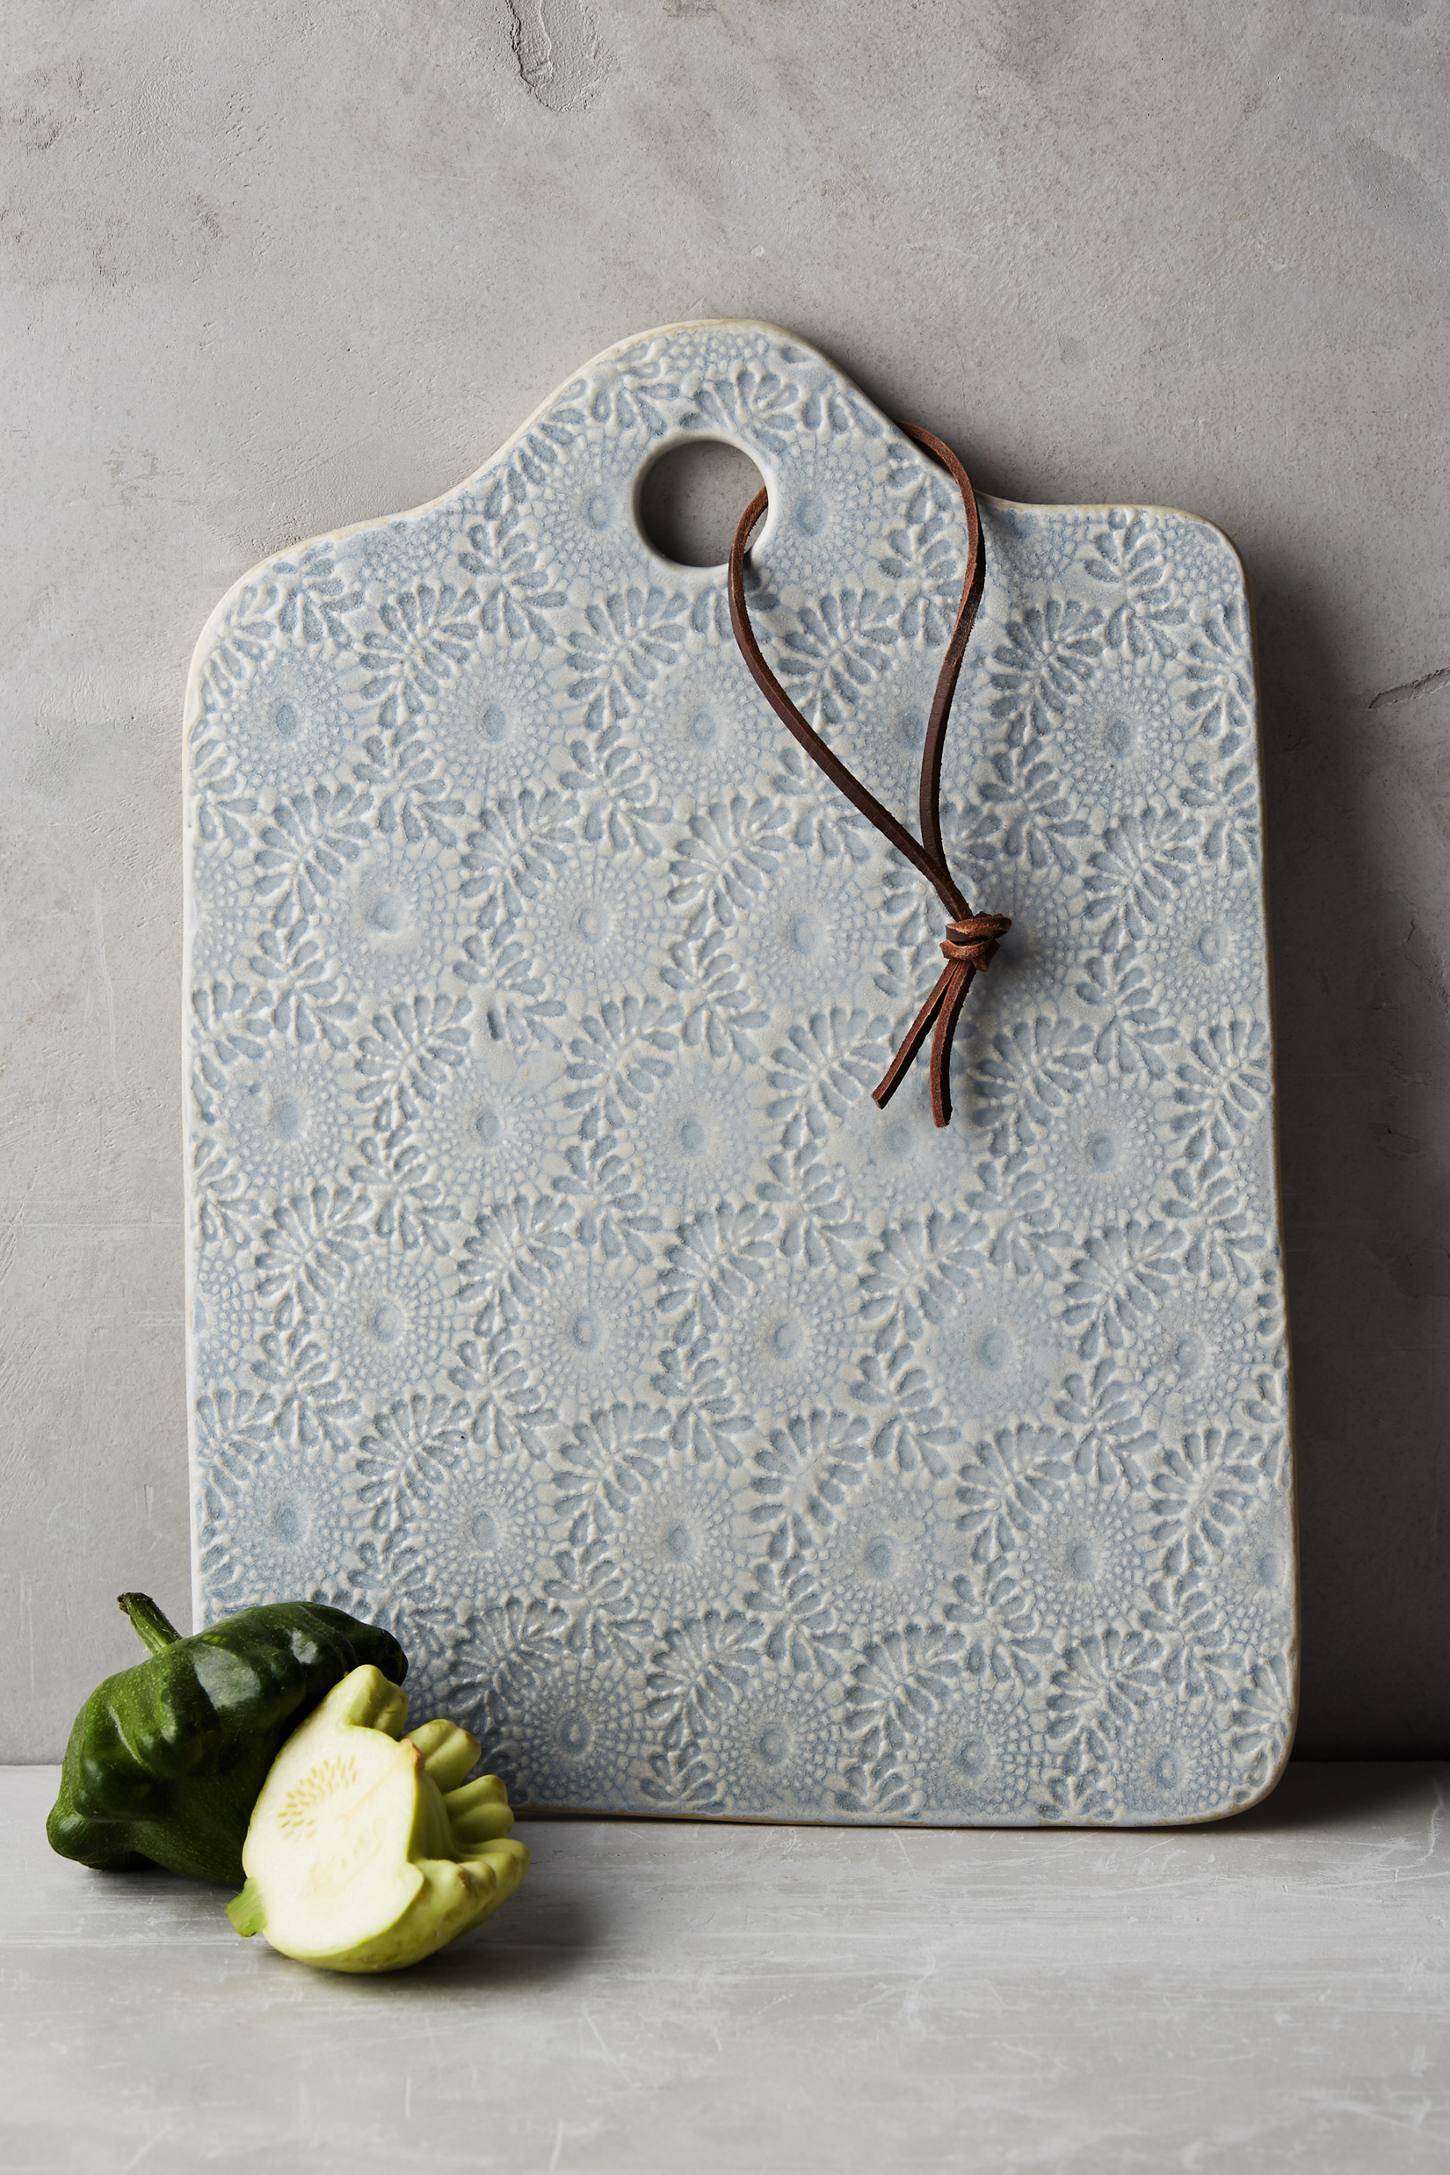 Ceramic Lacework Cheese Board Anthropologie